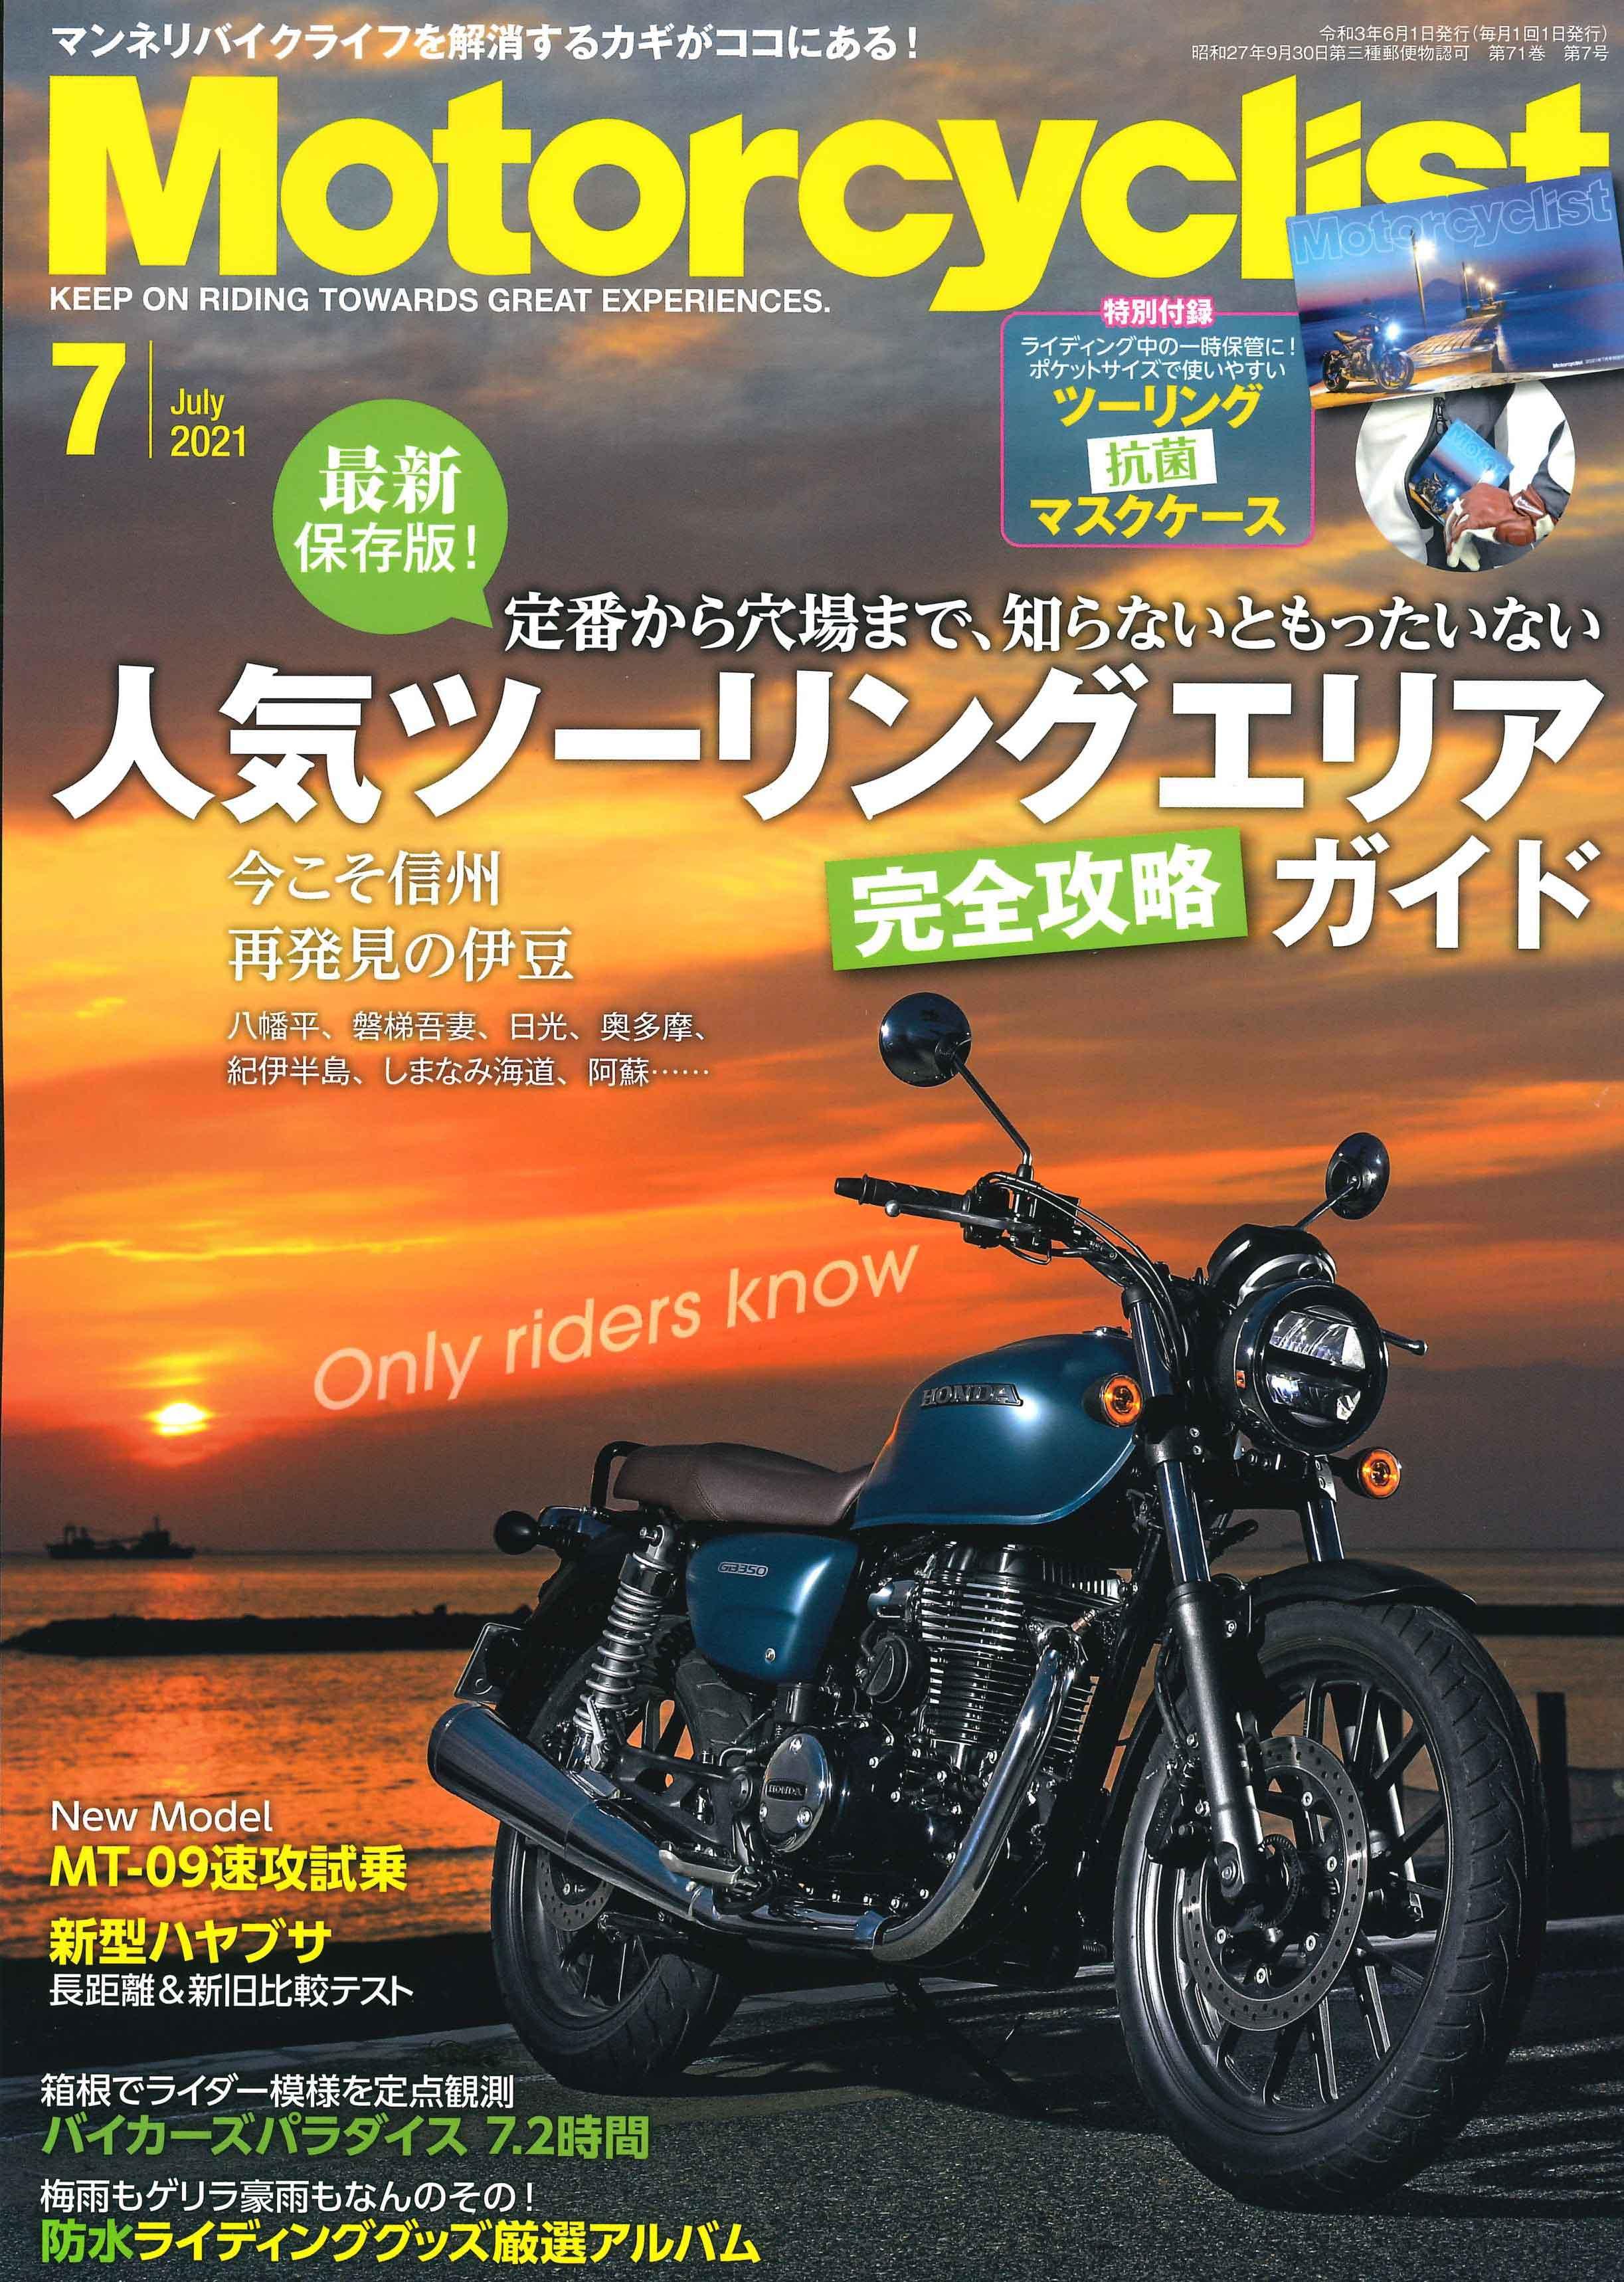 【Motorcyclist 2021年7月号掲載】B+COM SB6X / ONE